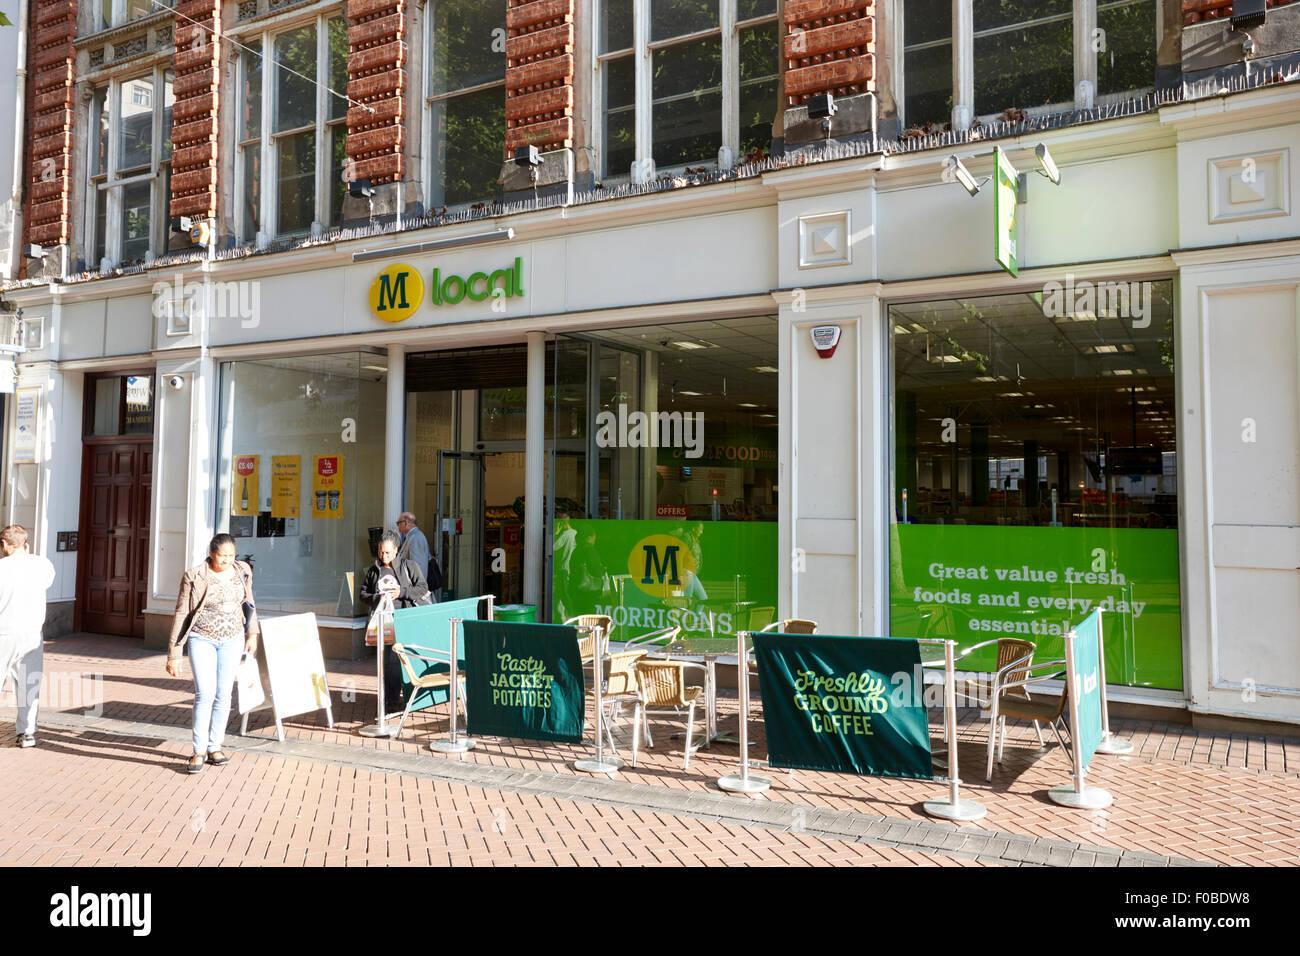 morrisons local store in Birmingham city centre UK - Stock Image